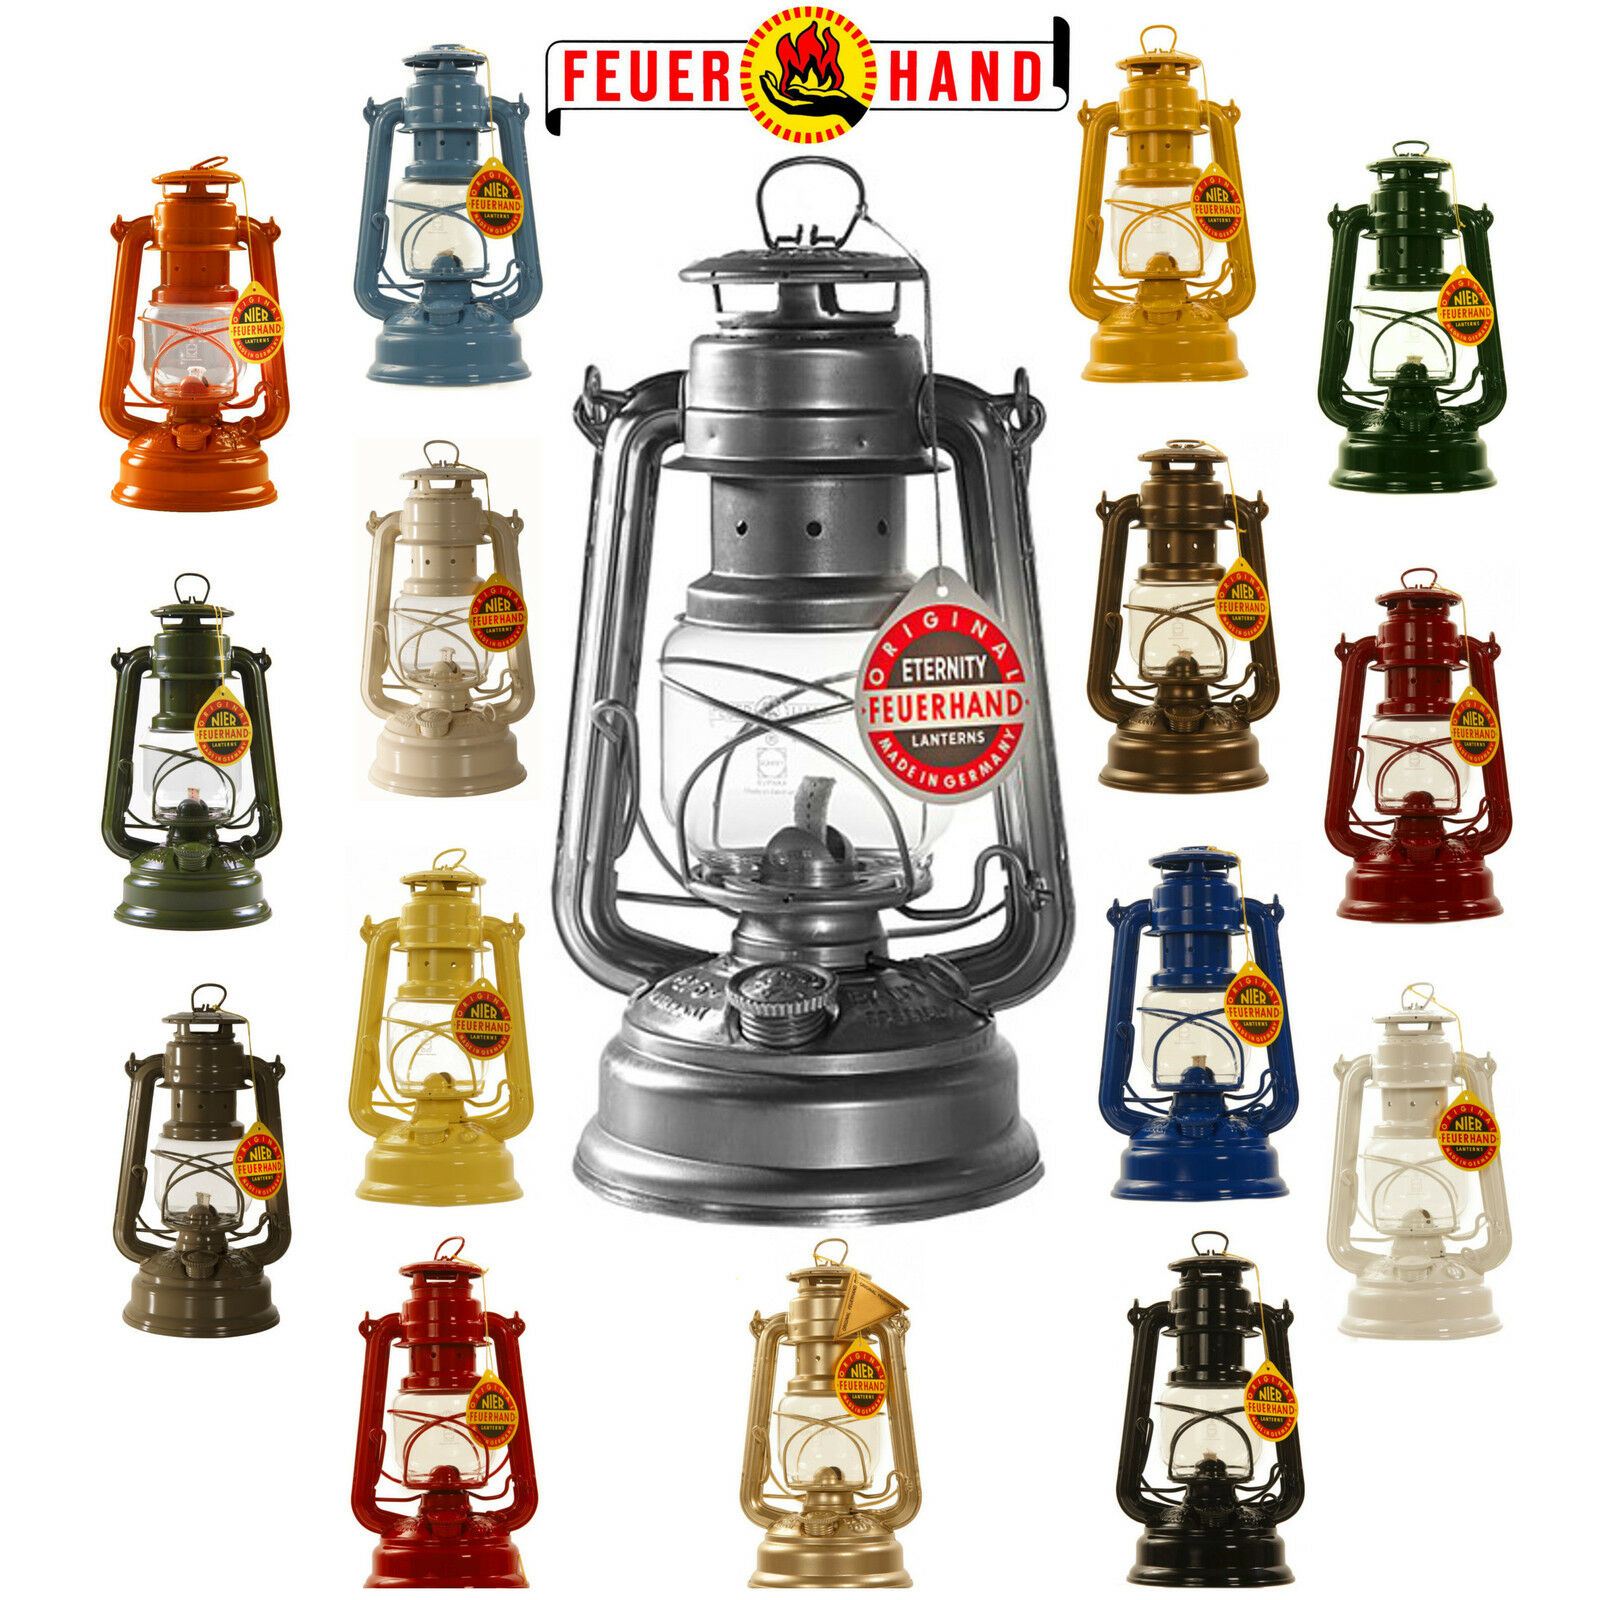 FEUERHAND® Sturmlaterne 276 Petroleumlaterne Petroleumlampe Petroleum Laterne  | Preiszugeständnisse